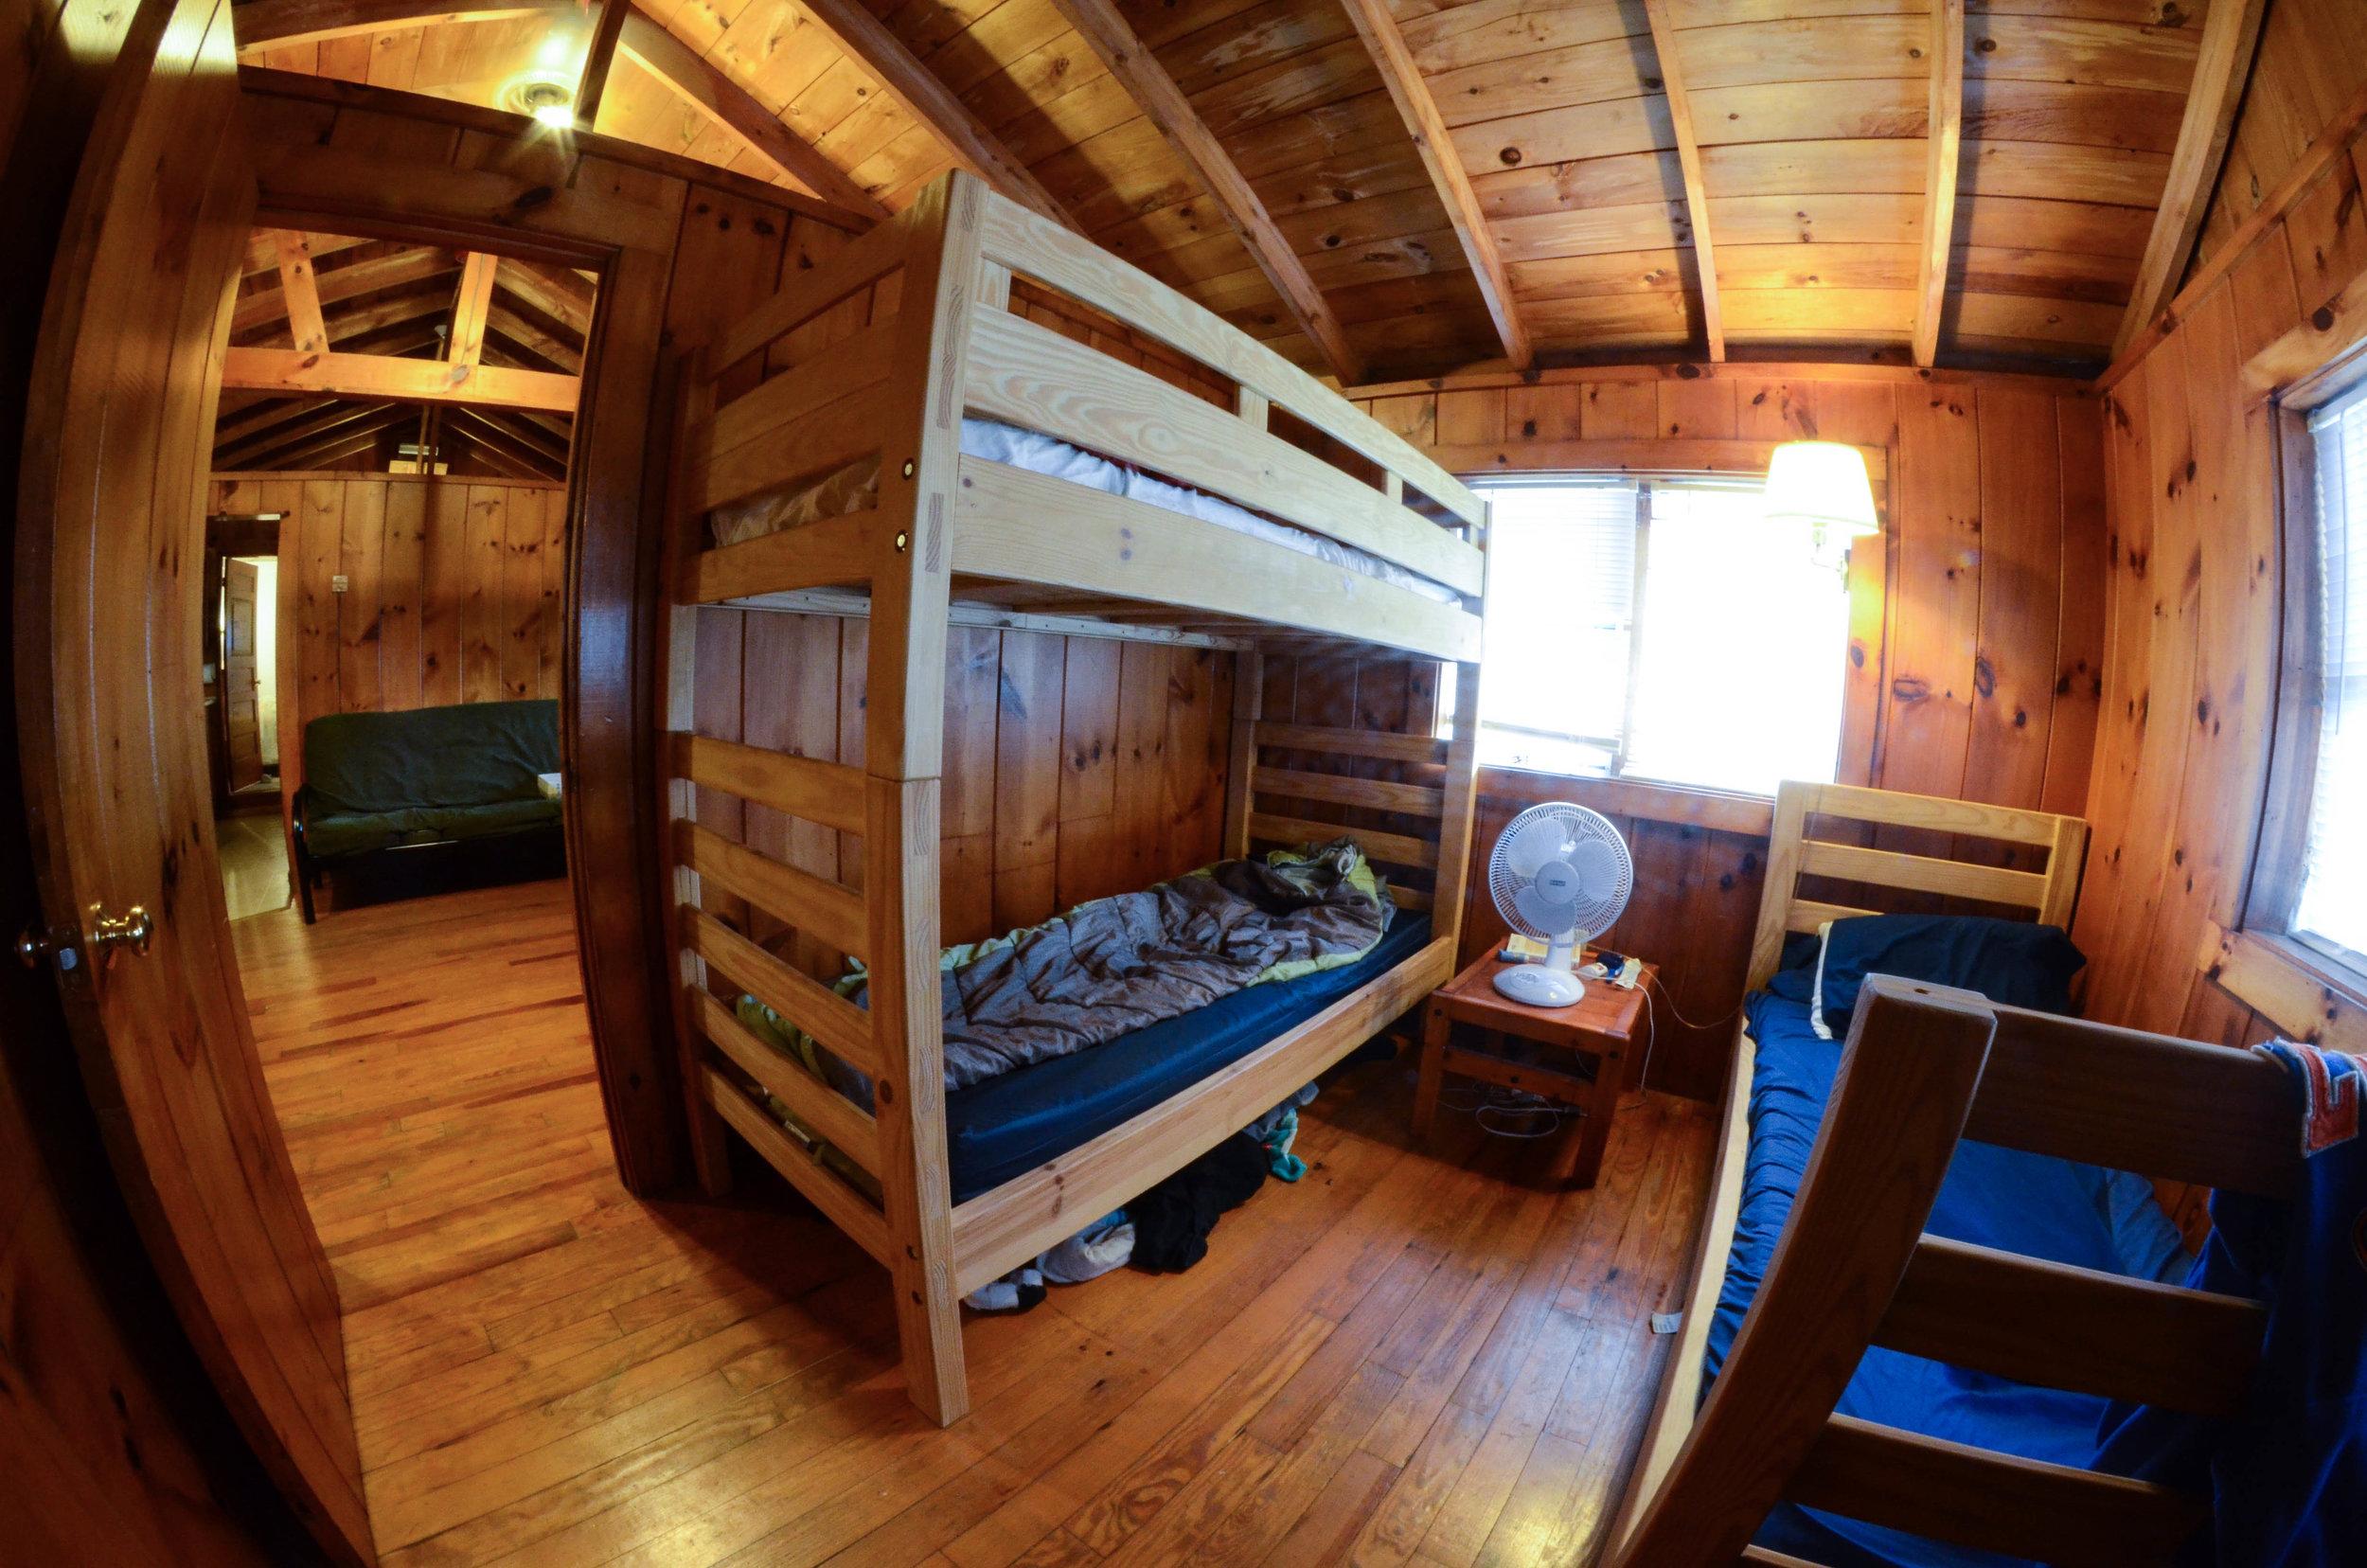 Rental Property Cabin Interior Bunk Beds